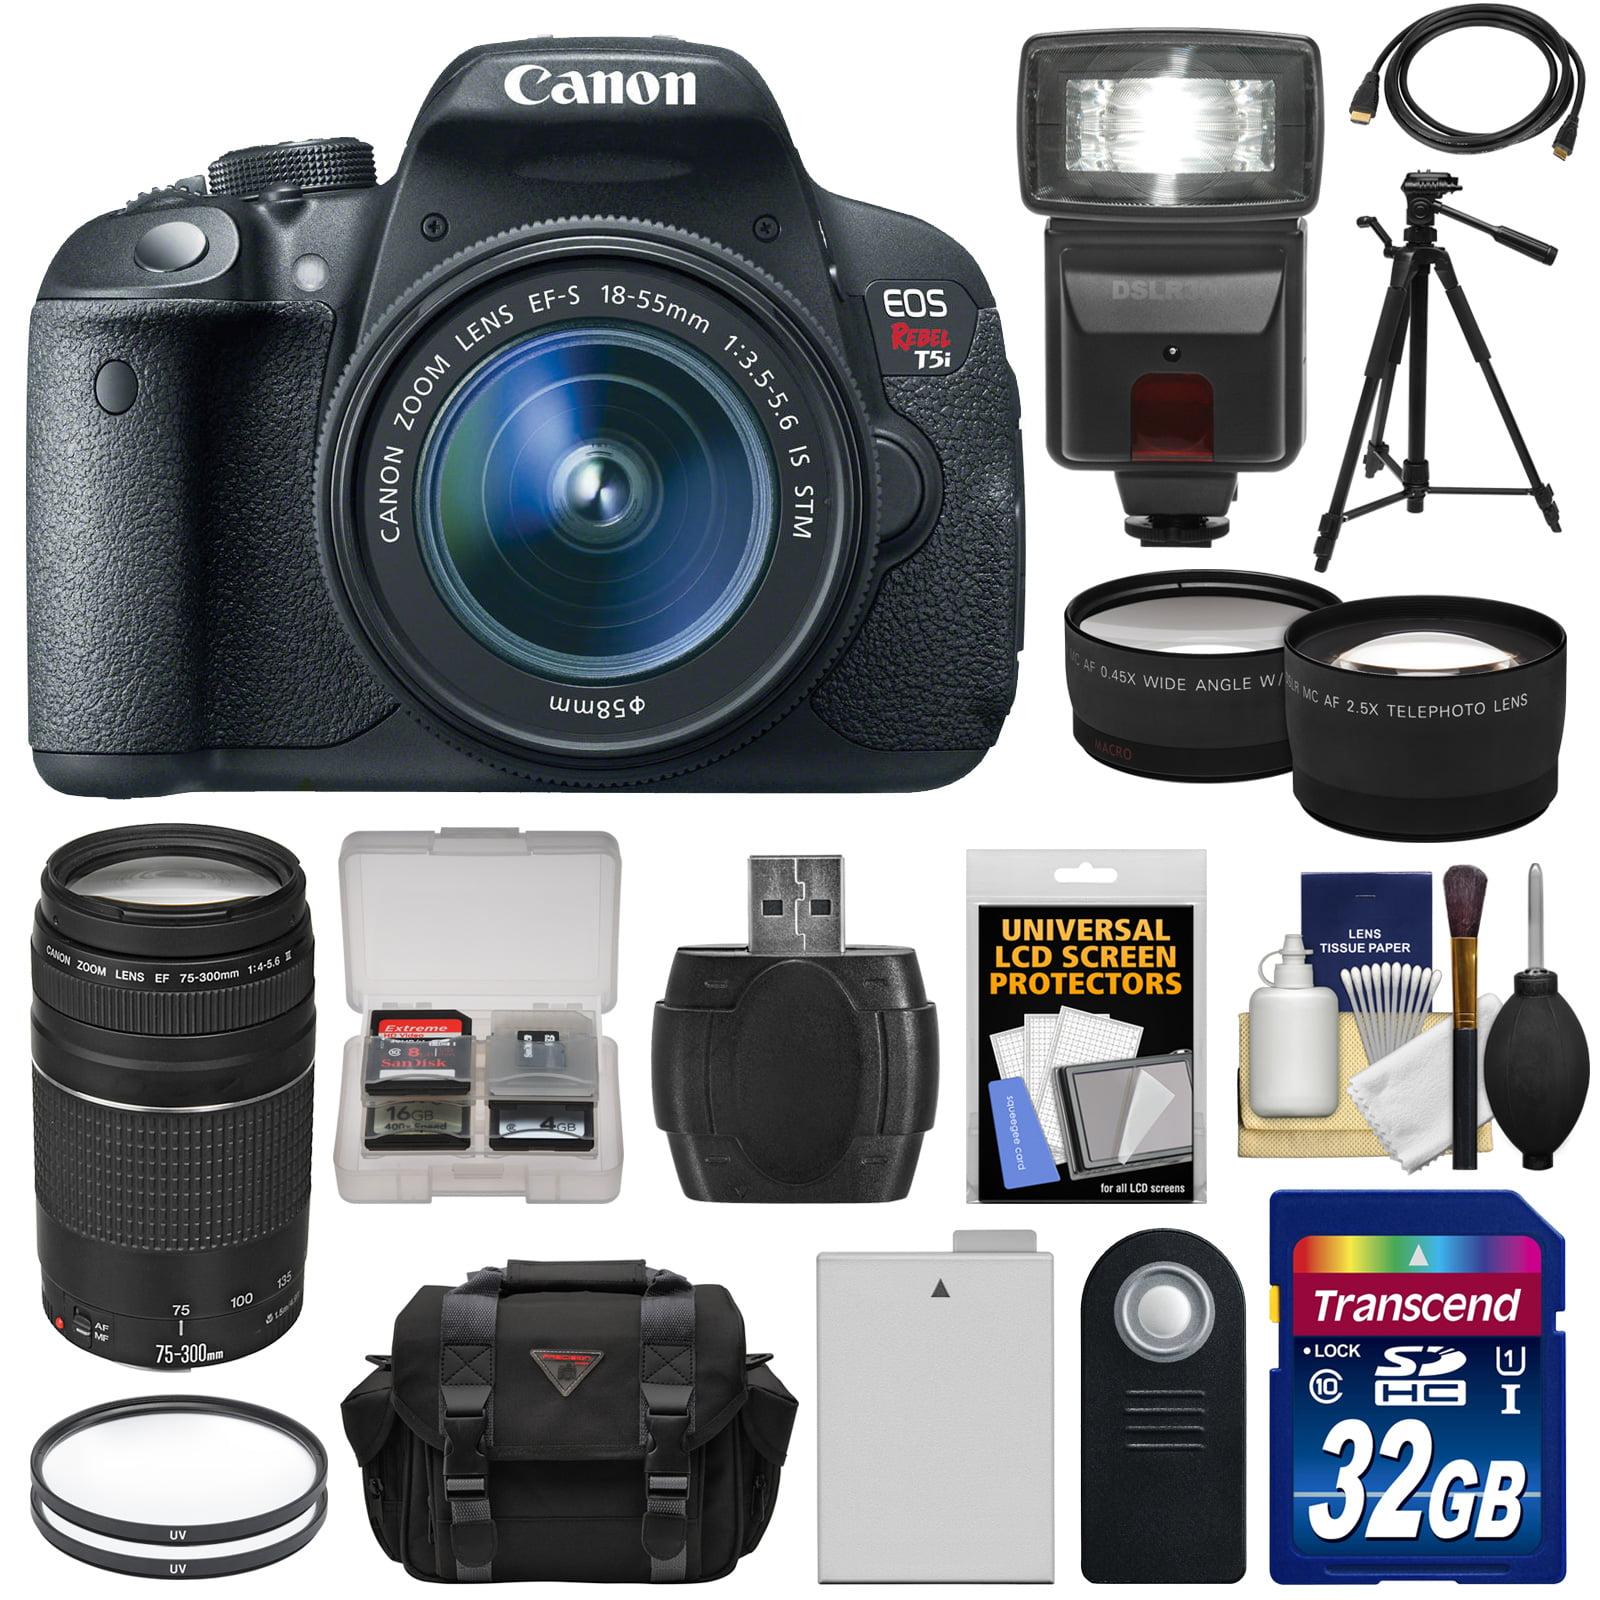 Canon Black Eos Rebel T5 Digital Slr Camera With 18 Megapixels And 1300d Lensa 55 Iii Wifi Kamera Dslr Kit 55mm Zoom Lens Included